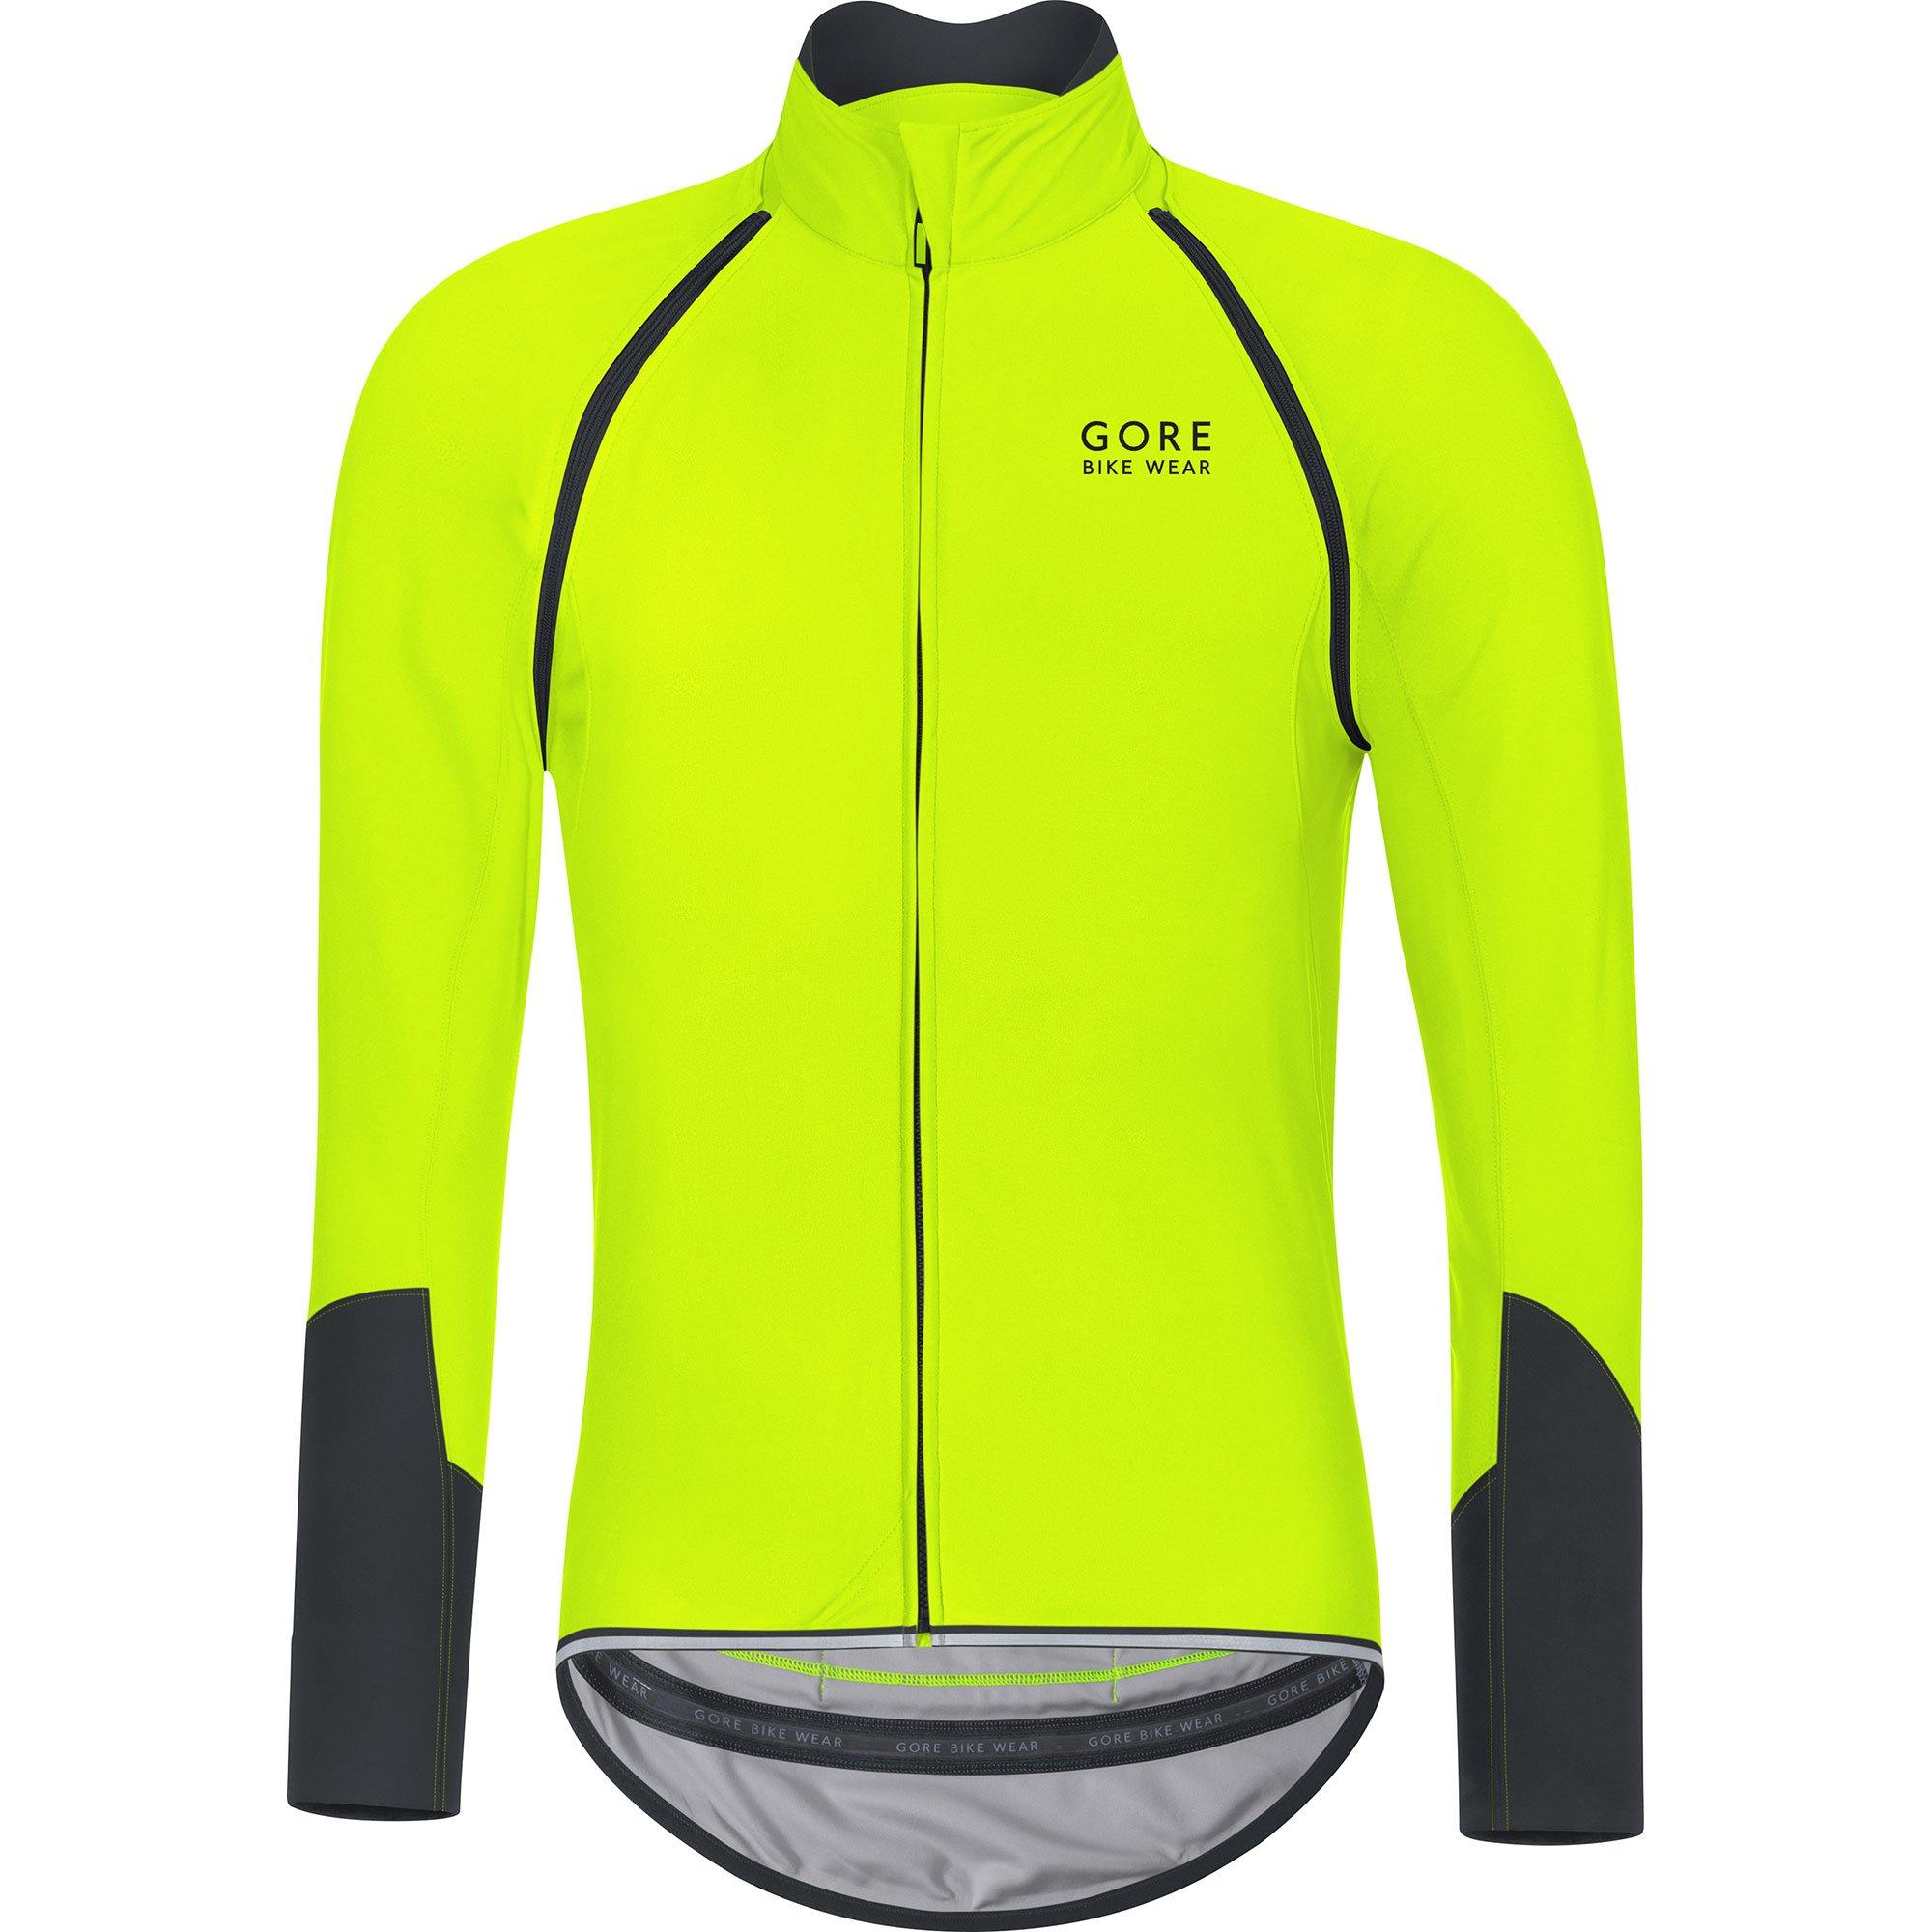 GORE BIKE WEAR Men's Cycling Jersey, Detachable Sleeves, GORE WINDSTOPPER Soft Shell, POWER, Size: XXL, Neon yellow/Black, SWZOPO